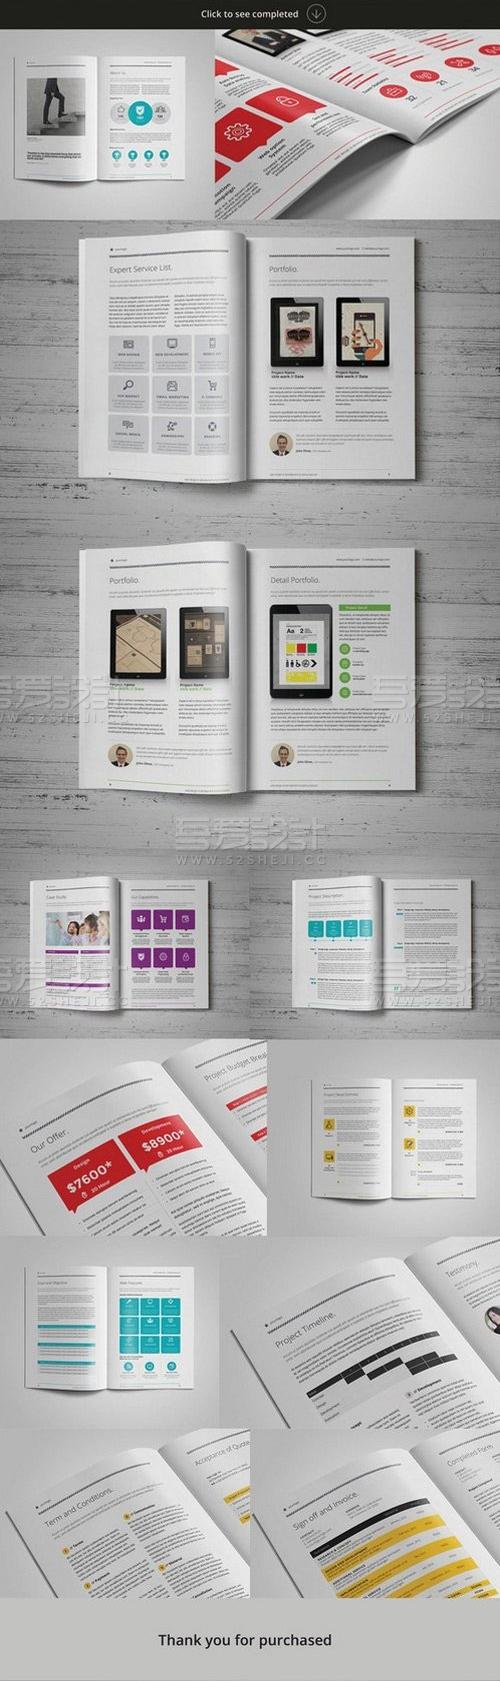 8-Print_10